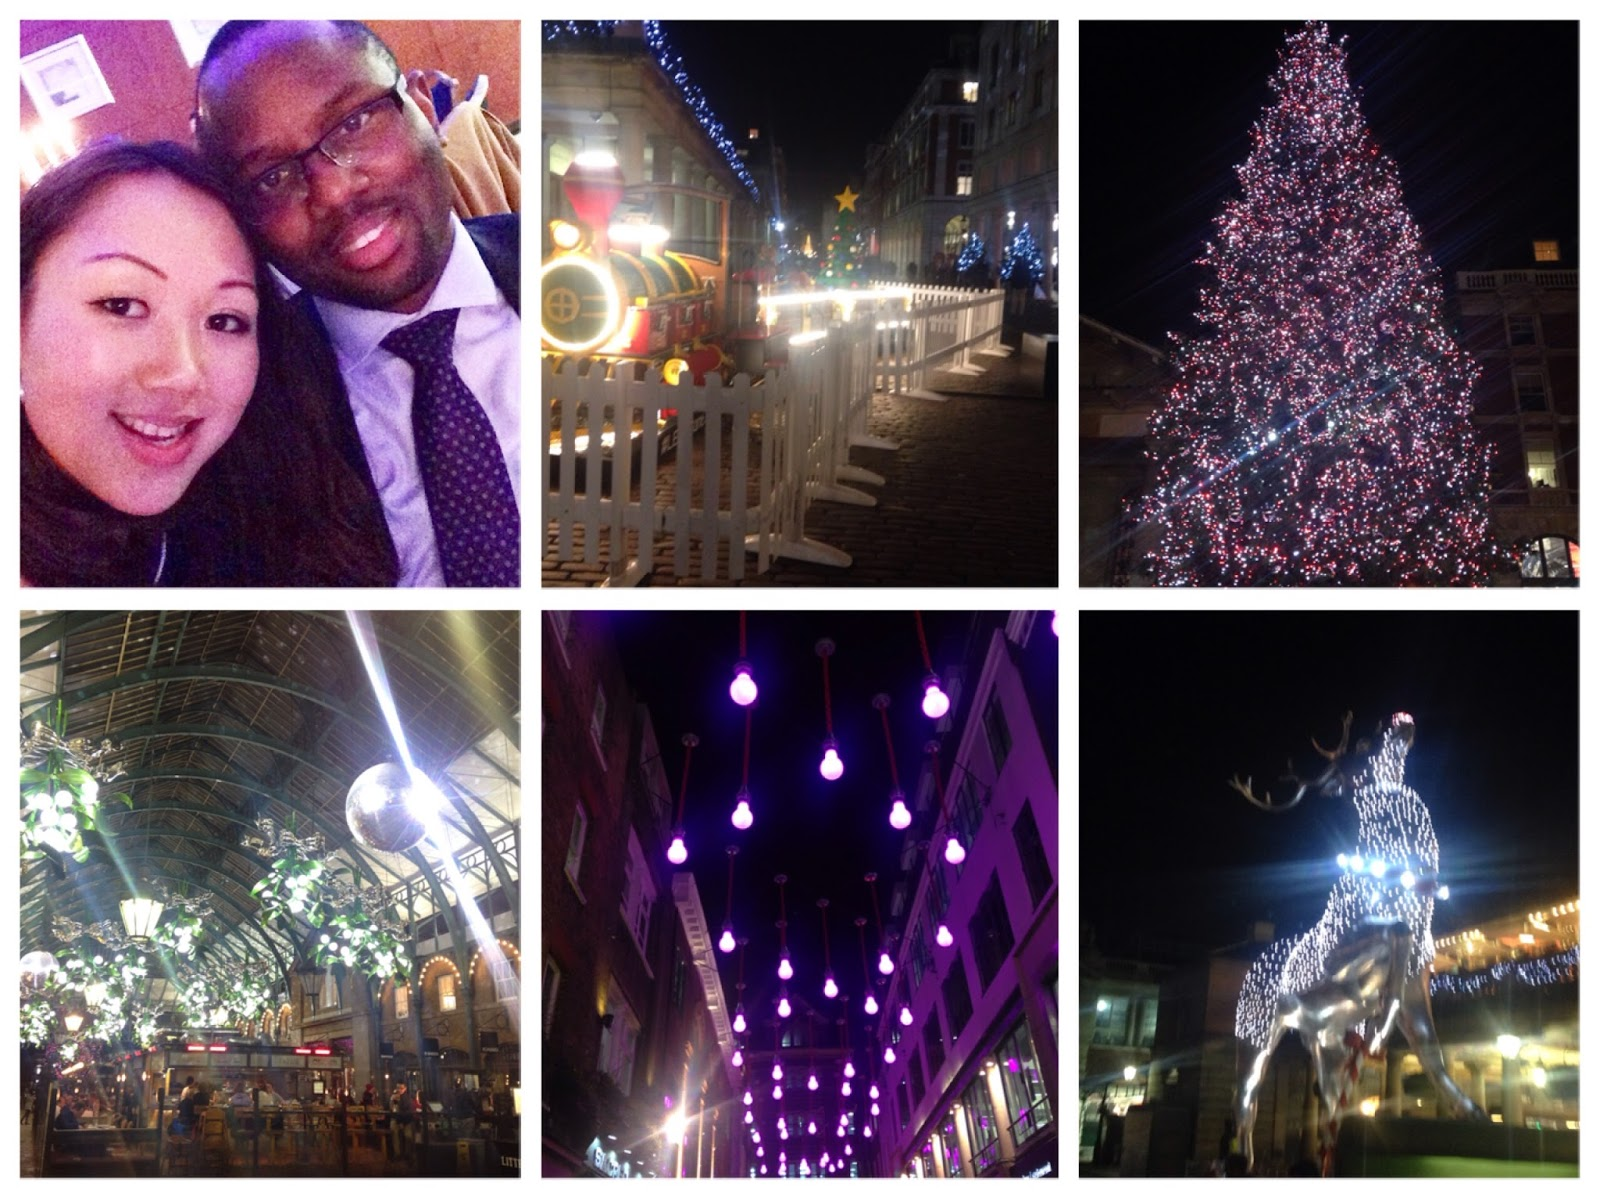 london diana what happened in december 2015